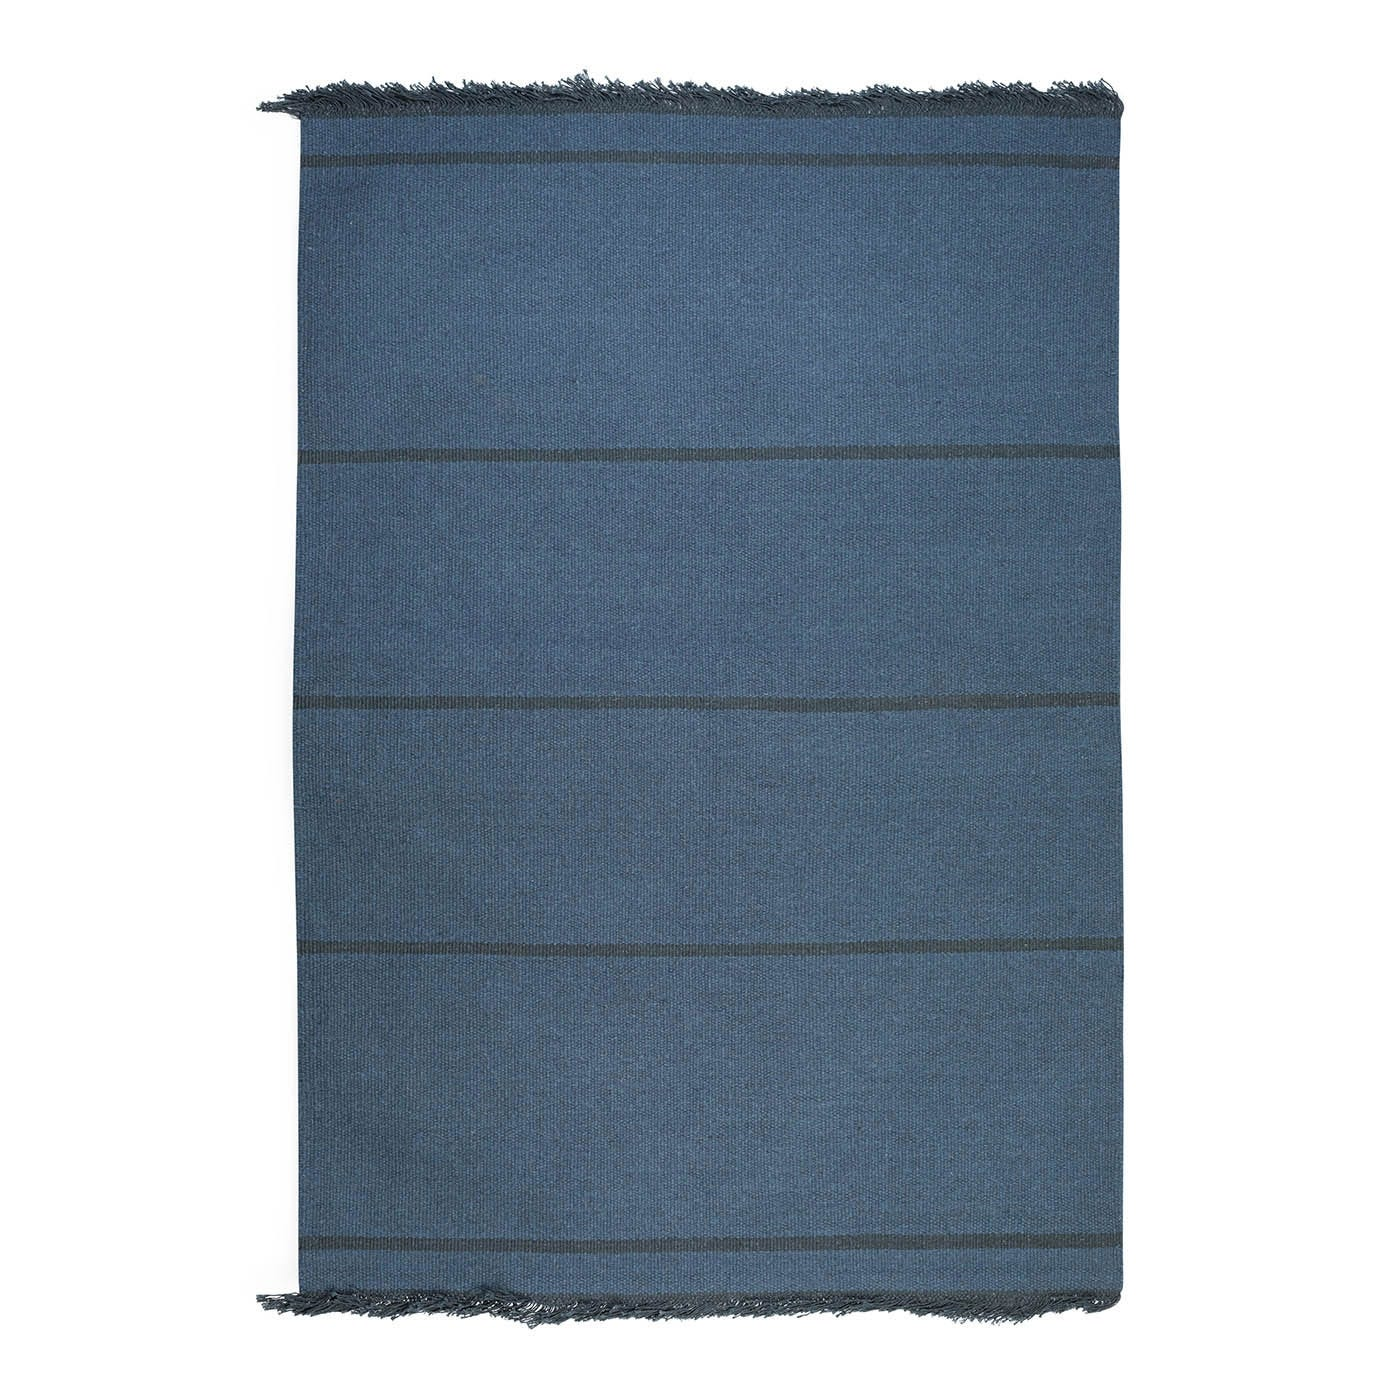 Varuna Rug Blue